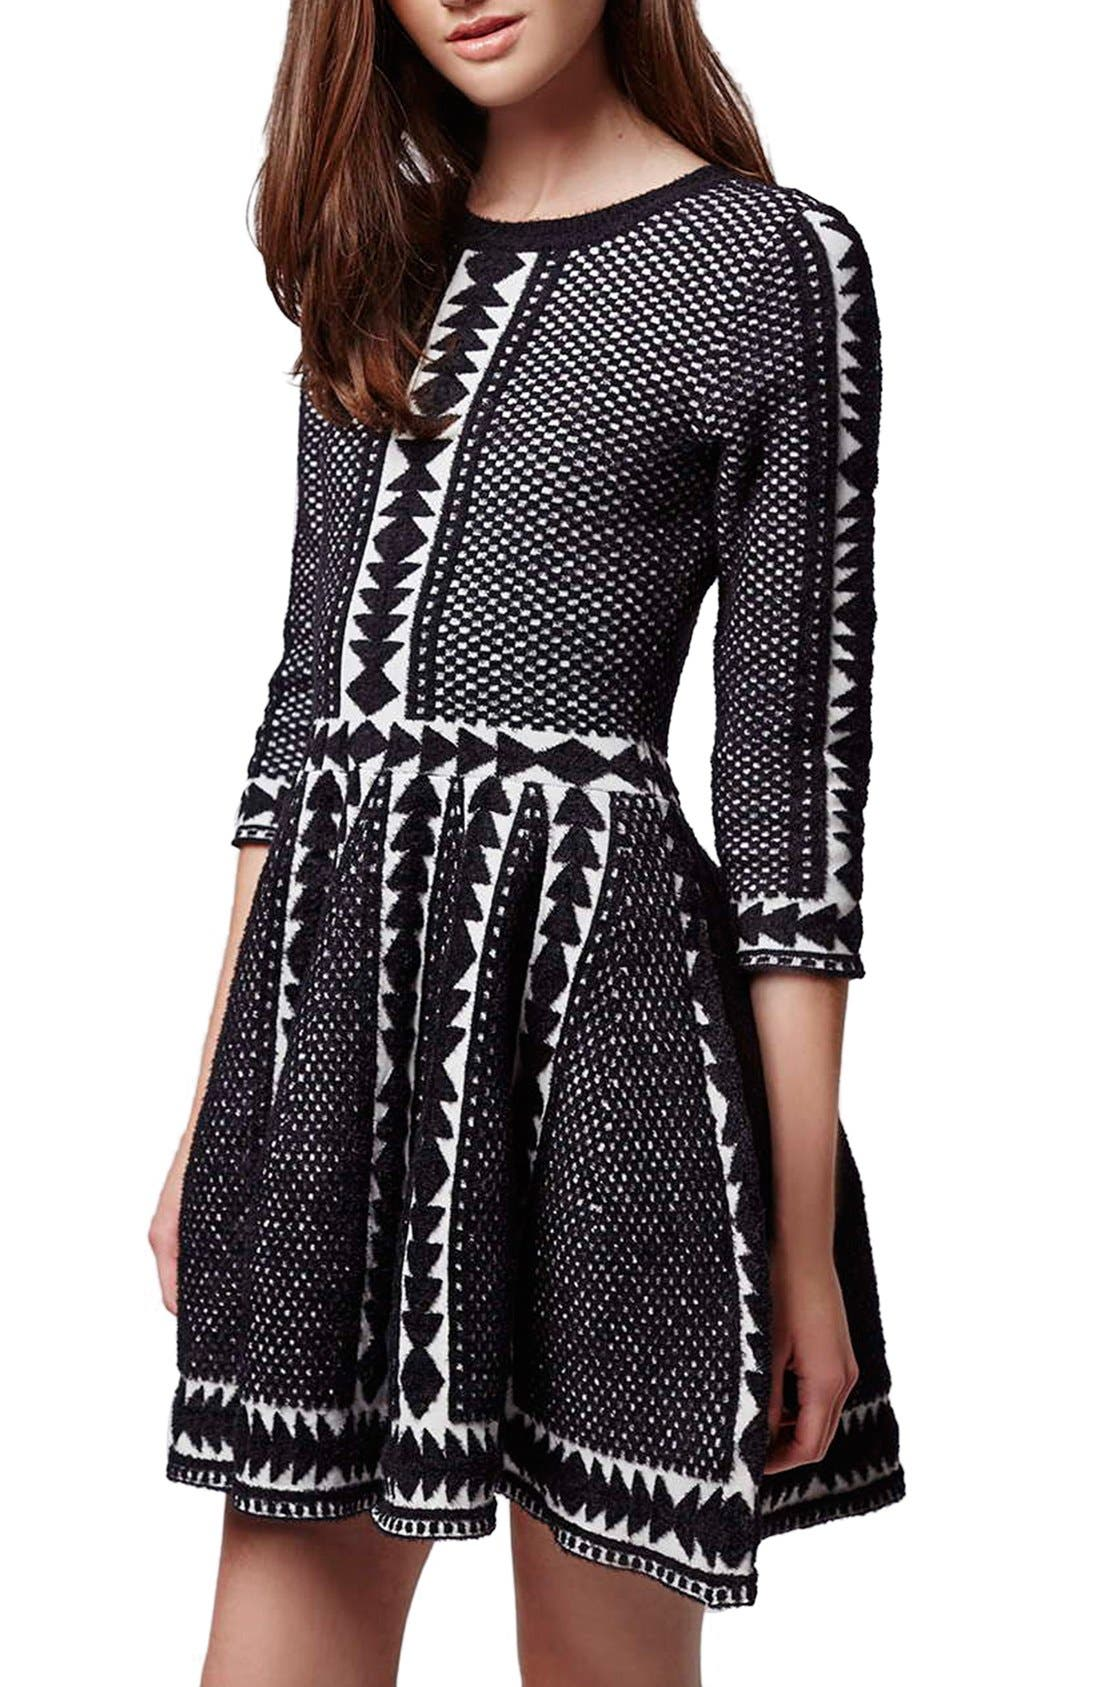 Alternate Image 1 Selected - Topshop 'Premium' Fit & Flare Sweater Dress